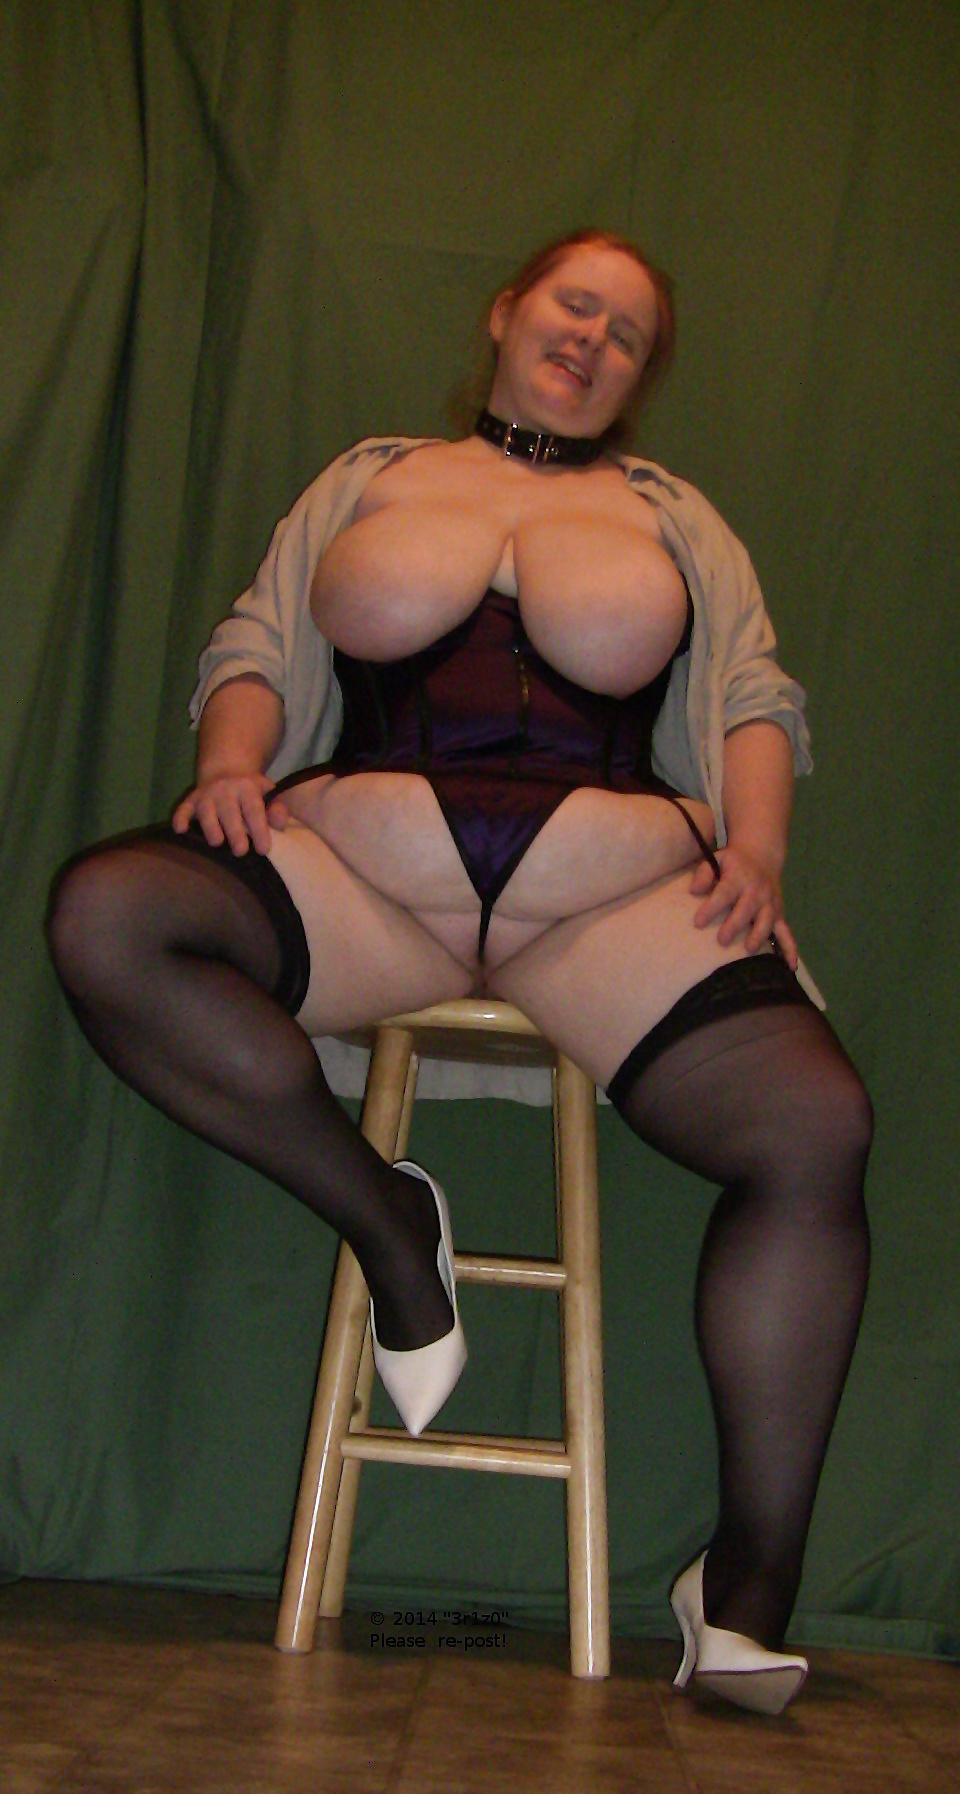 bbw-midget-in-stockings-big-nude-teen-hooters